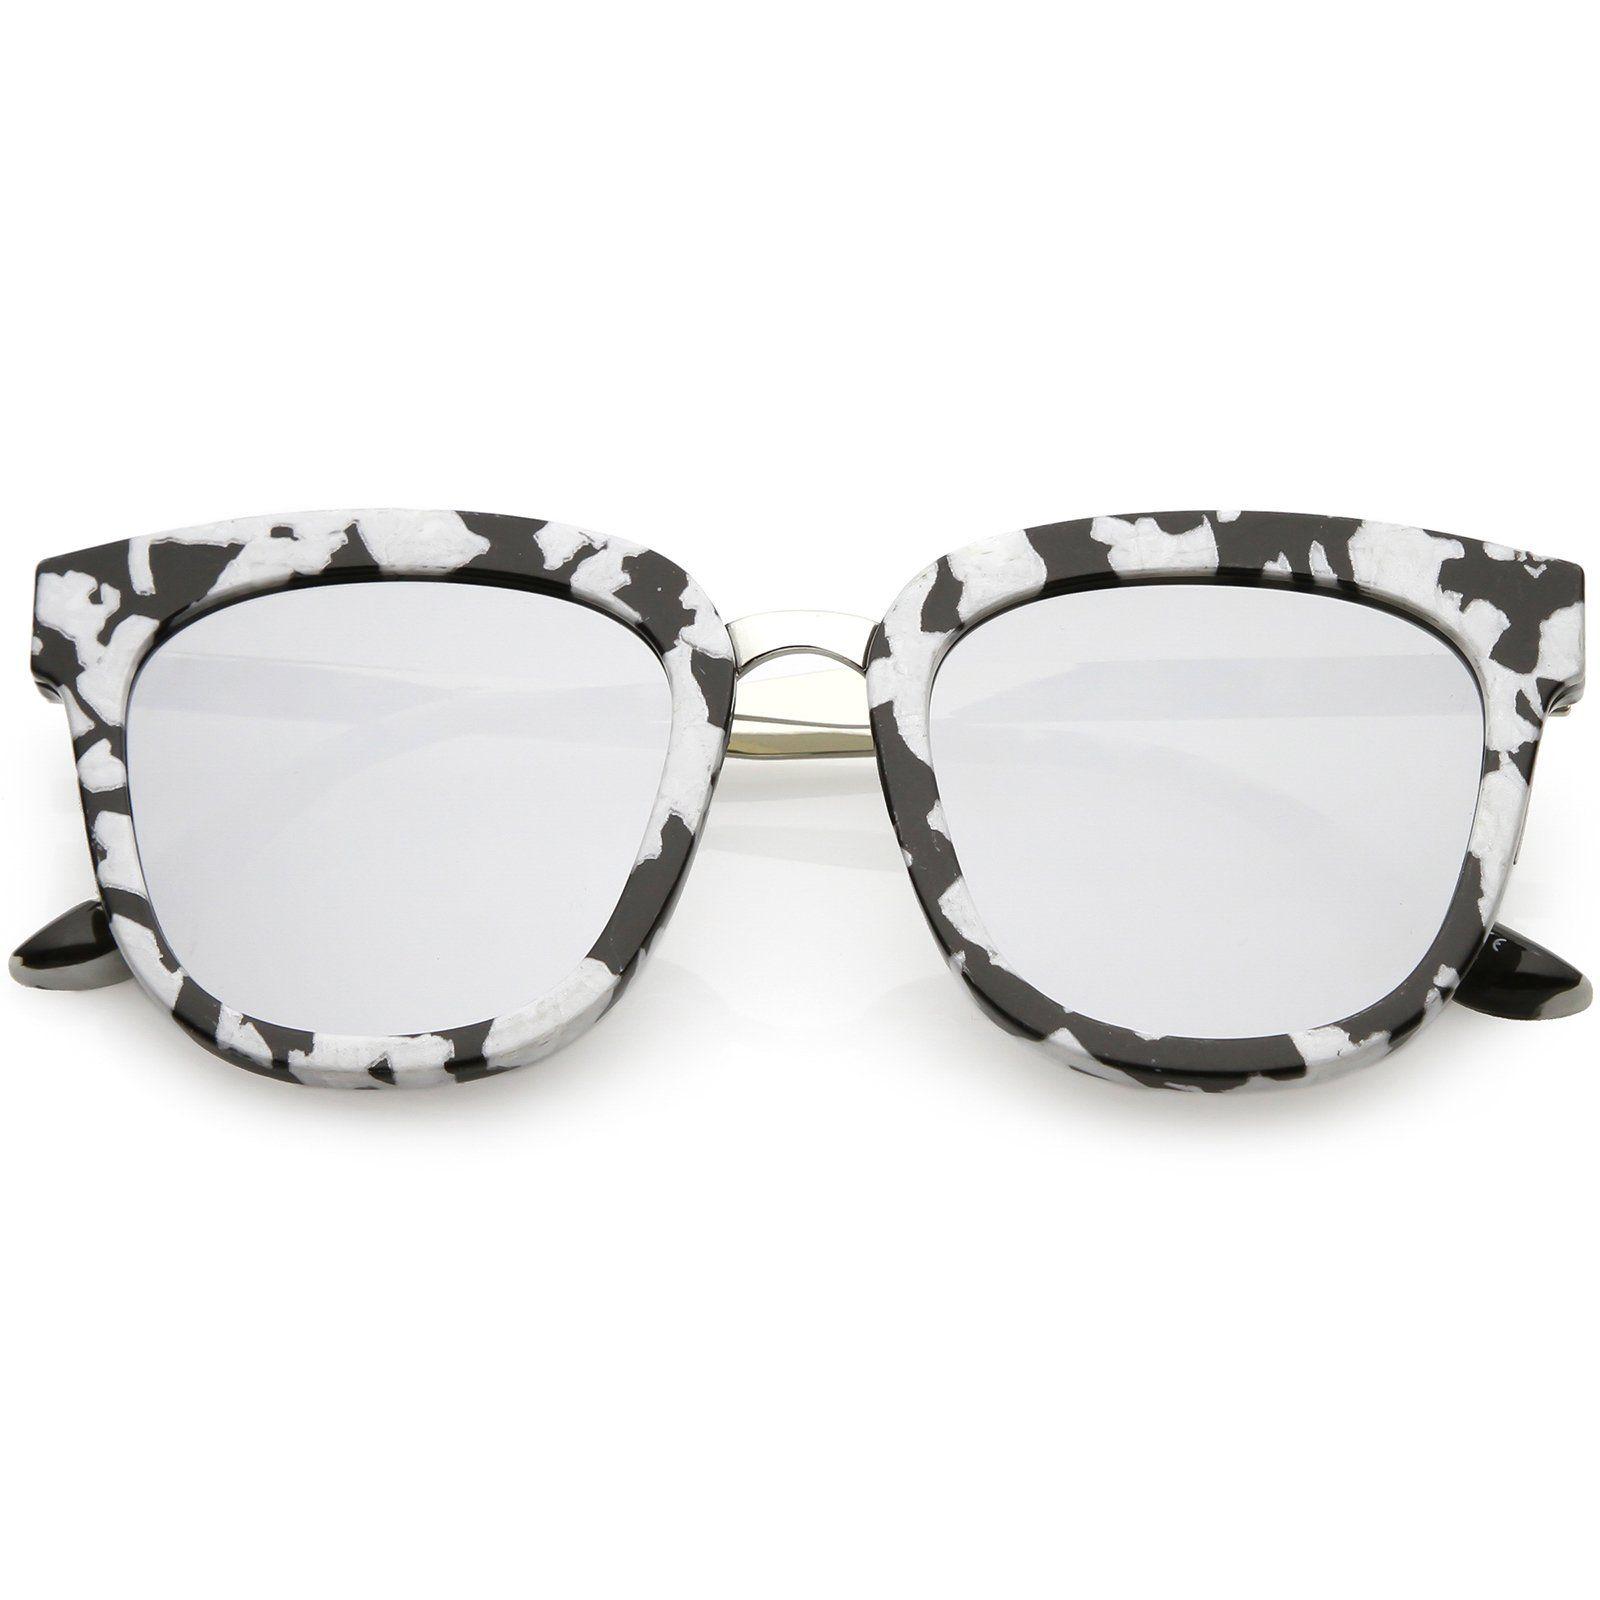 b7f5ce4640948 ... Horn Rimmed Sunglasses Metal Nose Bridge Colored Mirror Square Flat Lens  49mm  sunglasses  frame  sunglass  oversized  mirrored  summer  sunglassla  ...